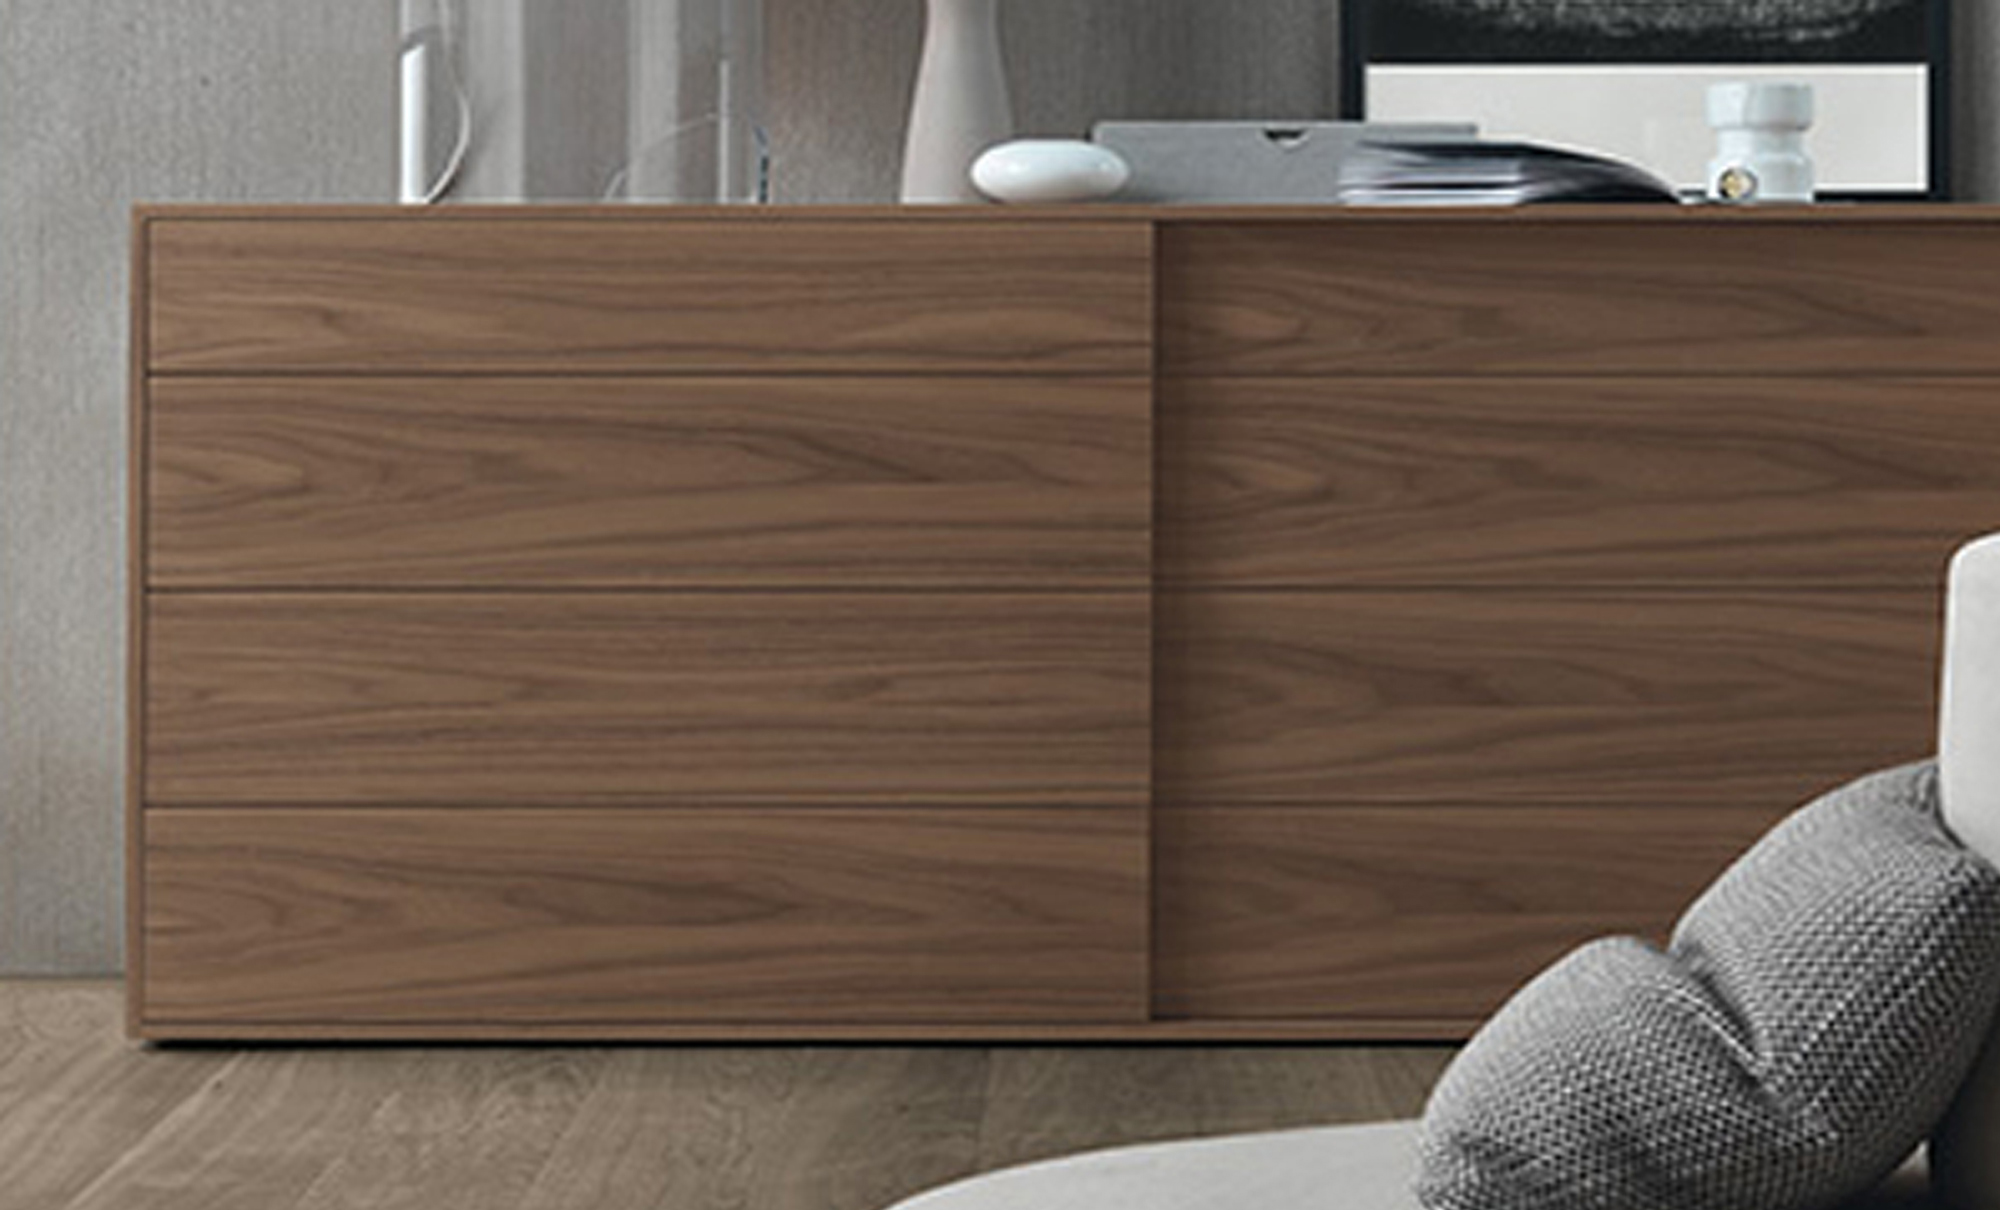 Bedroom CabinetsFanuli Furniture